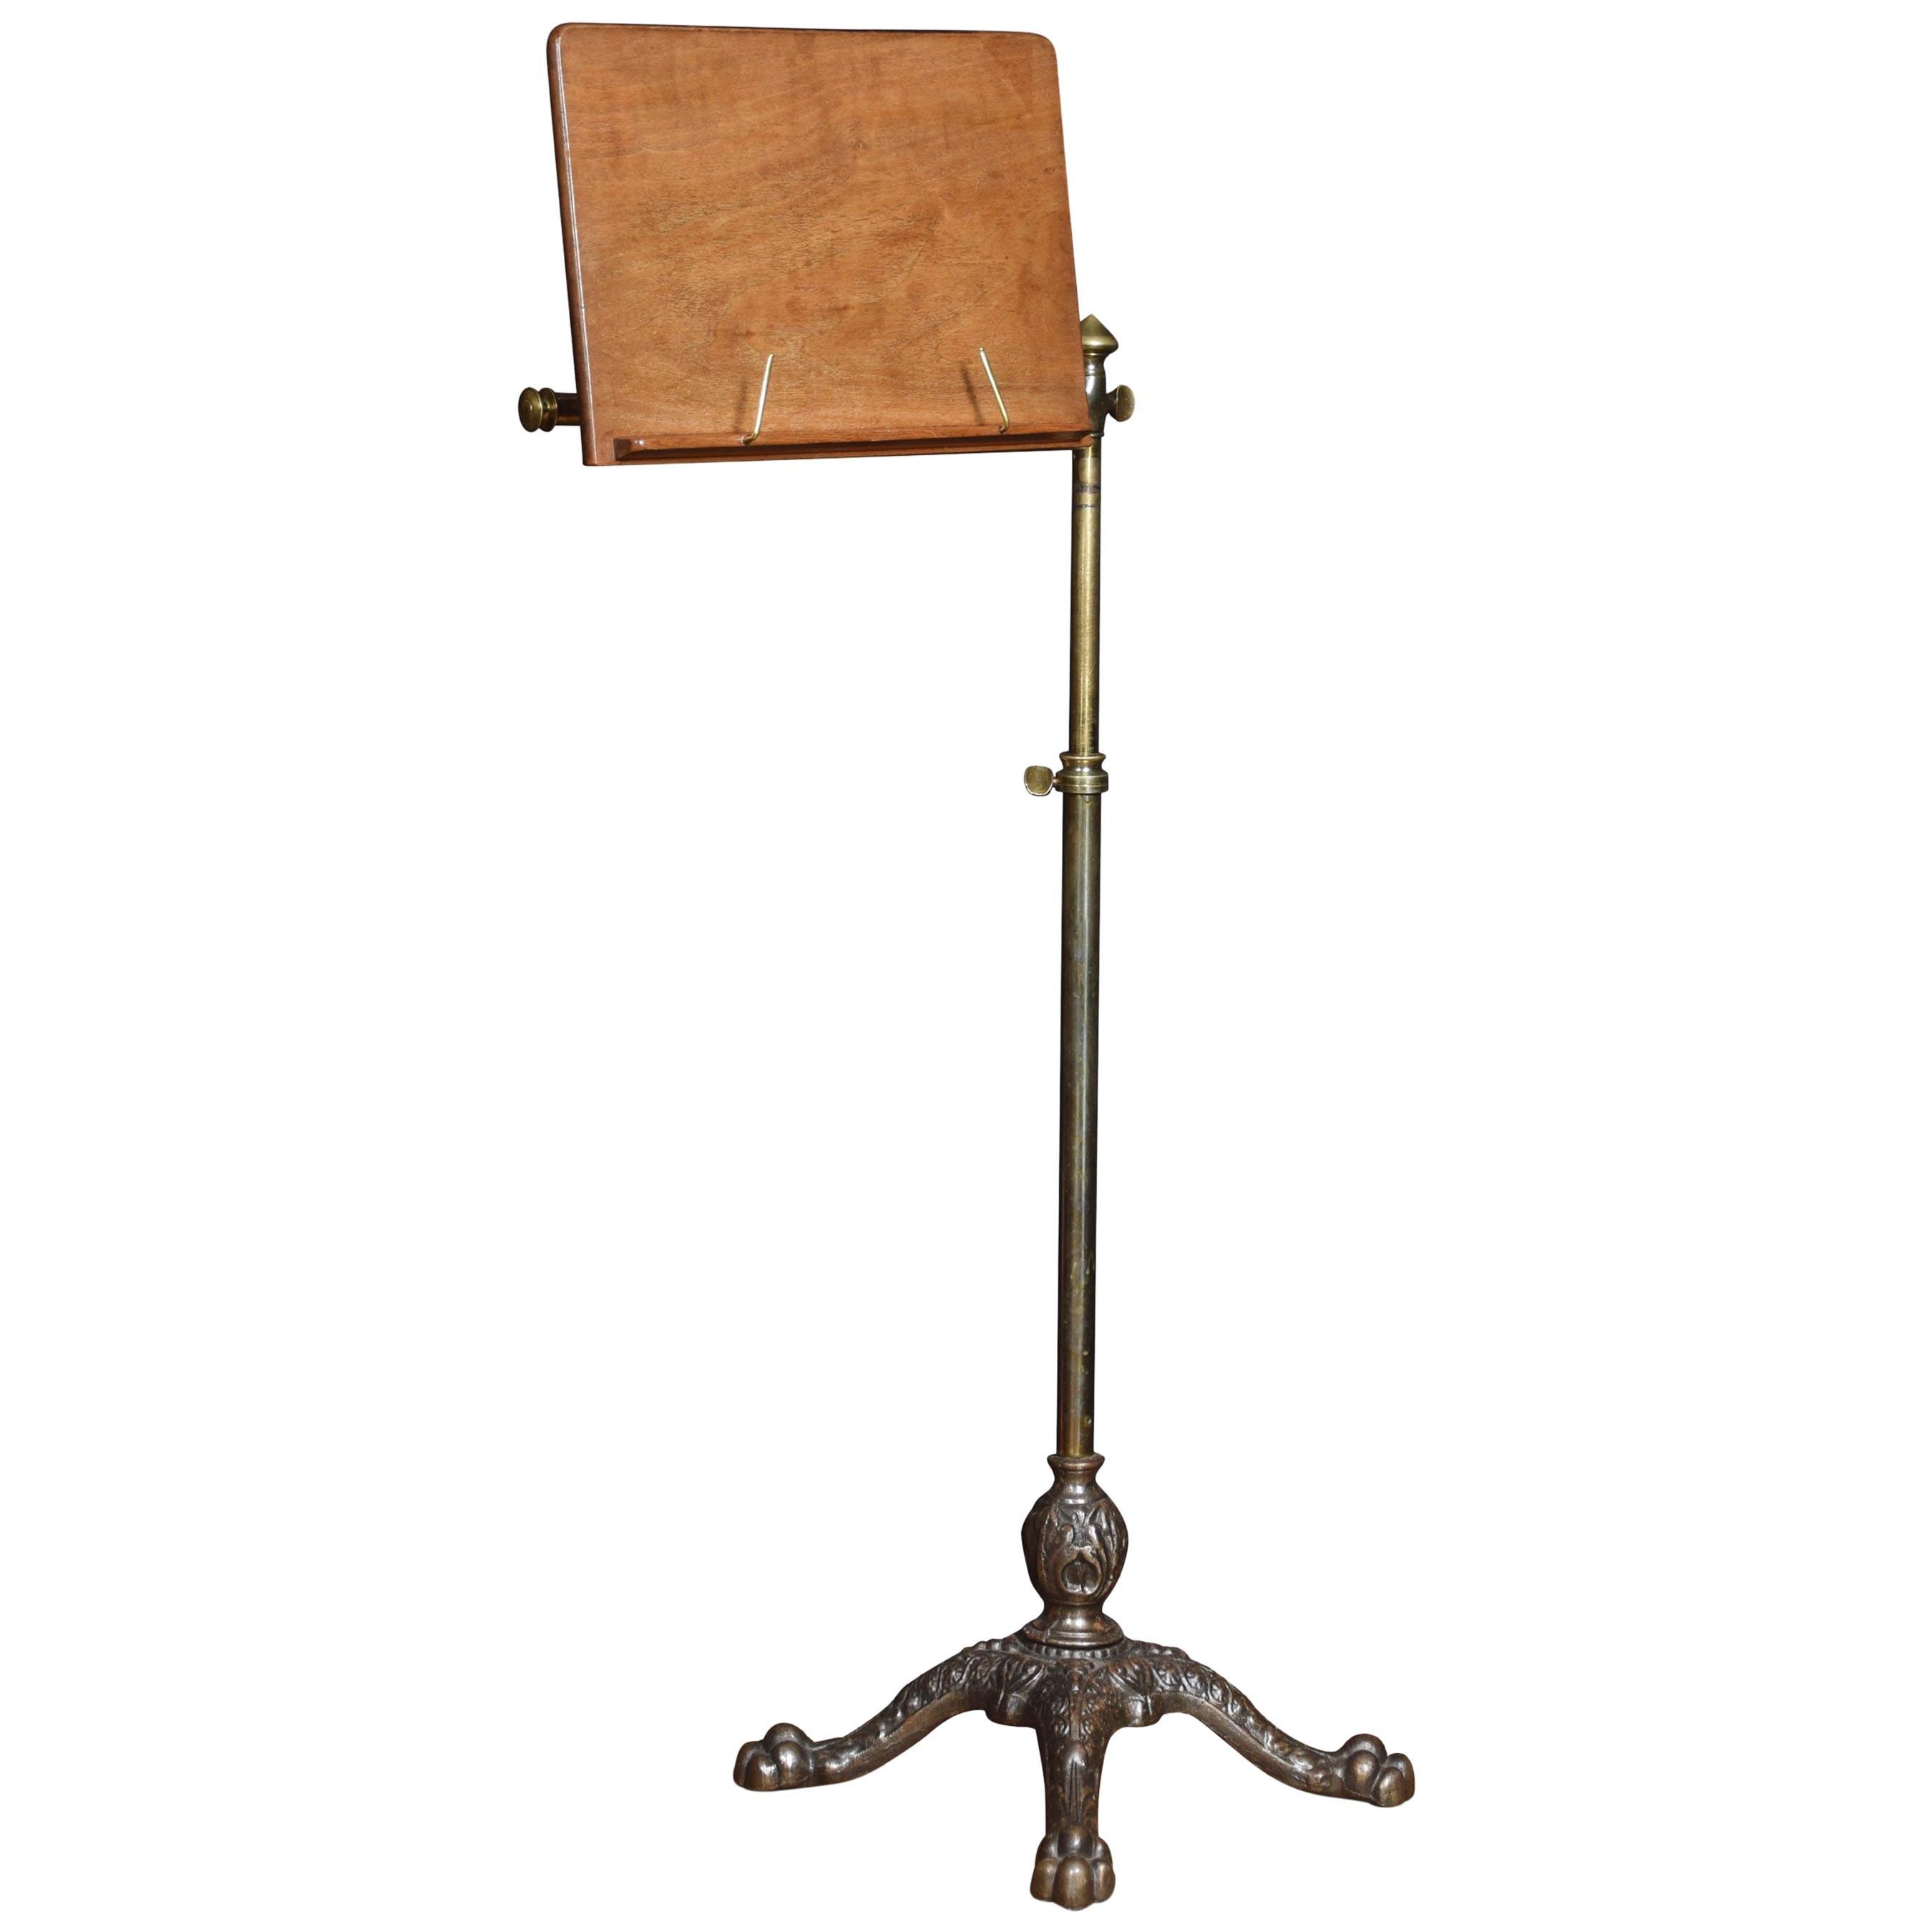 19th Century Adjustable Music Stand